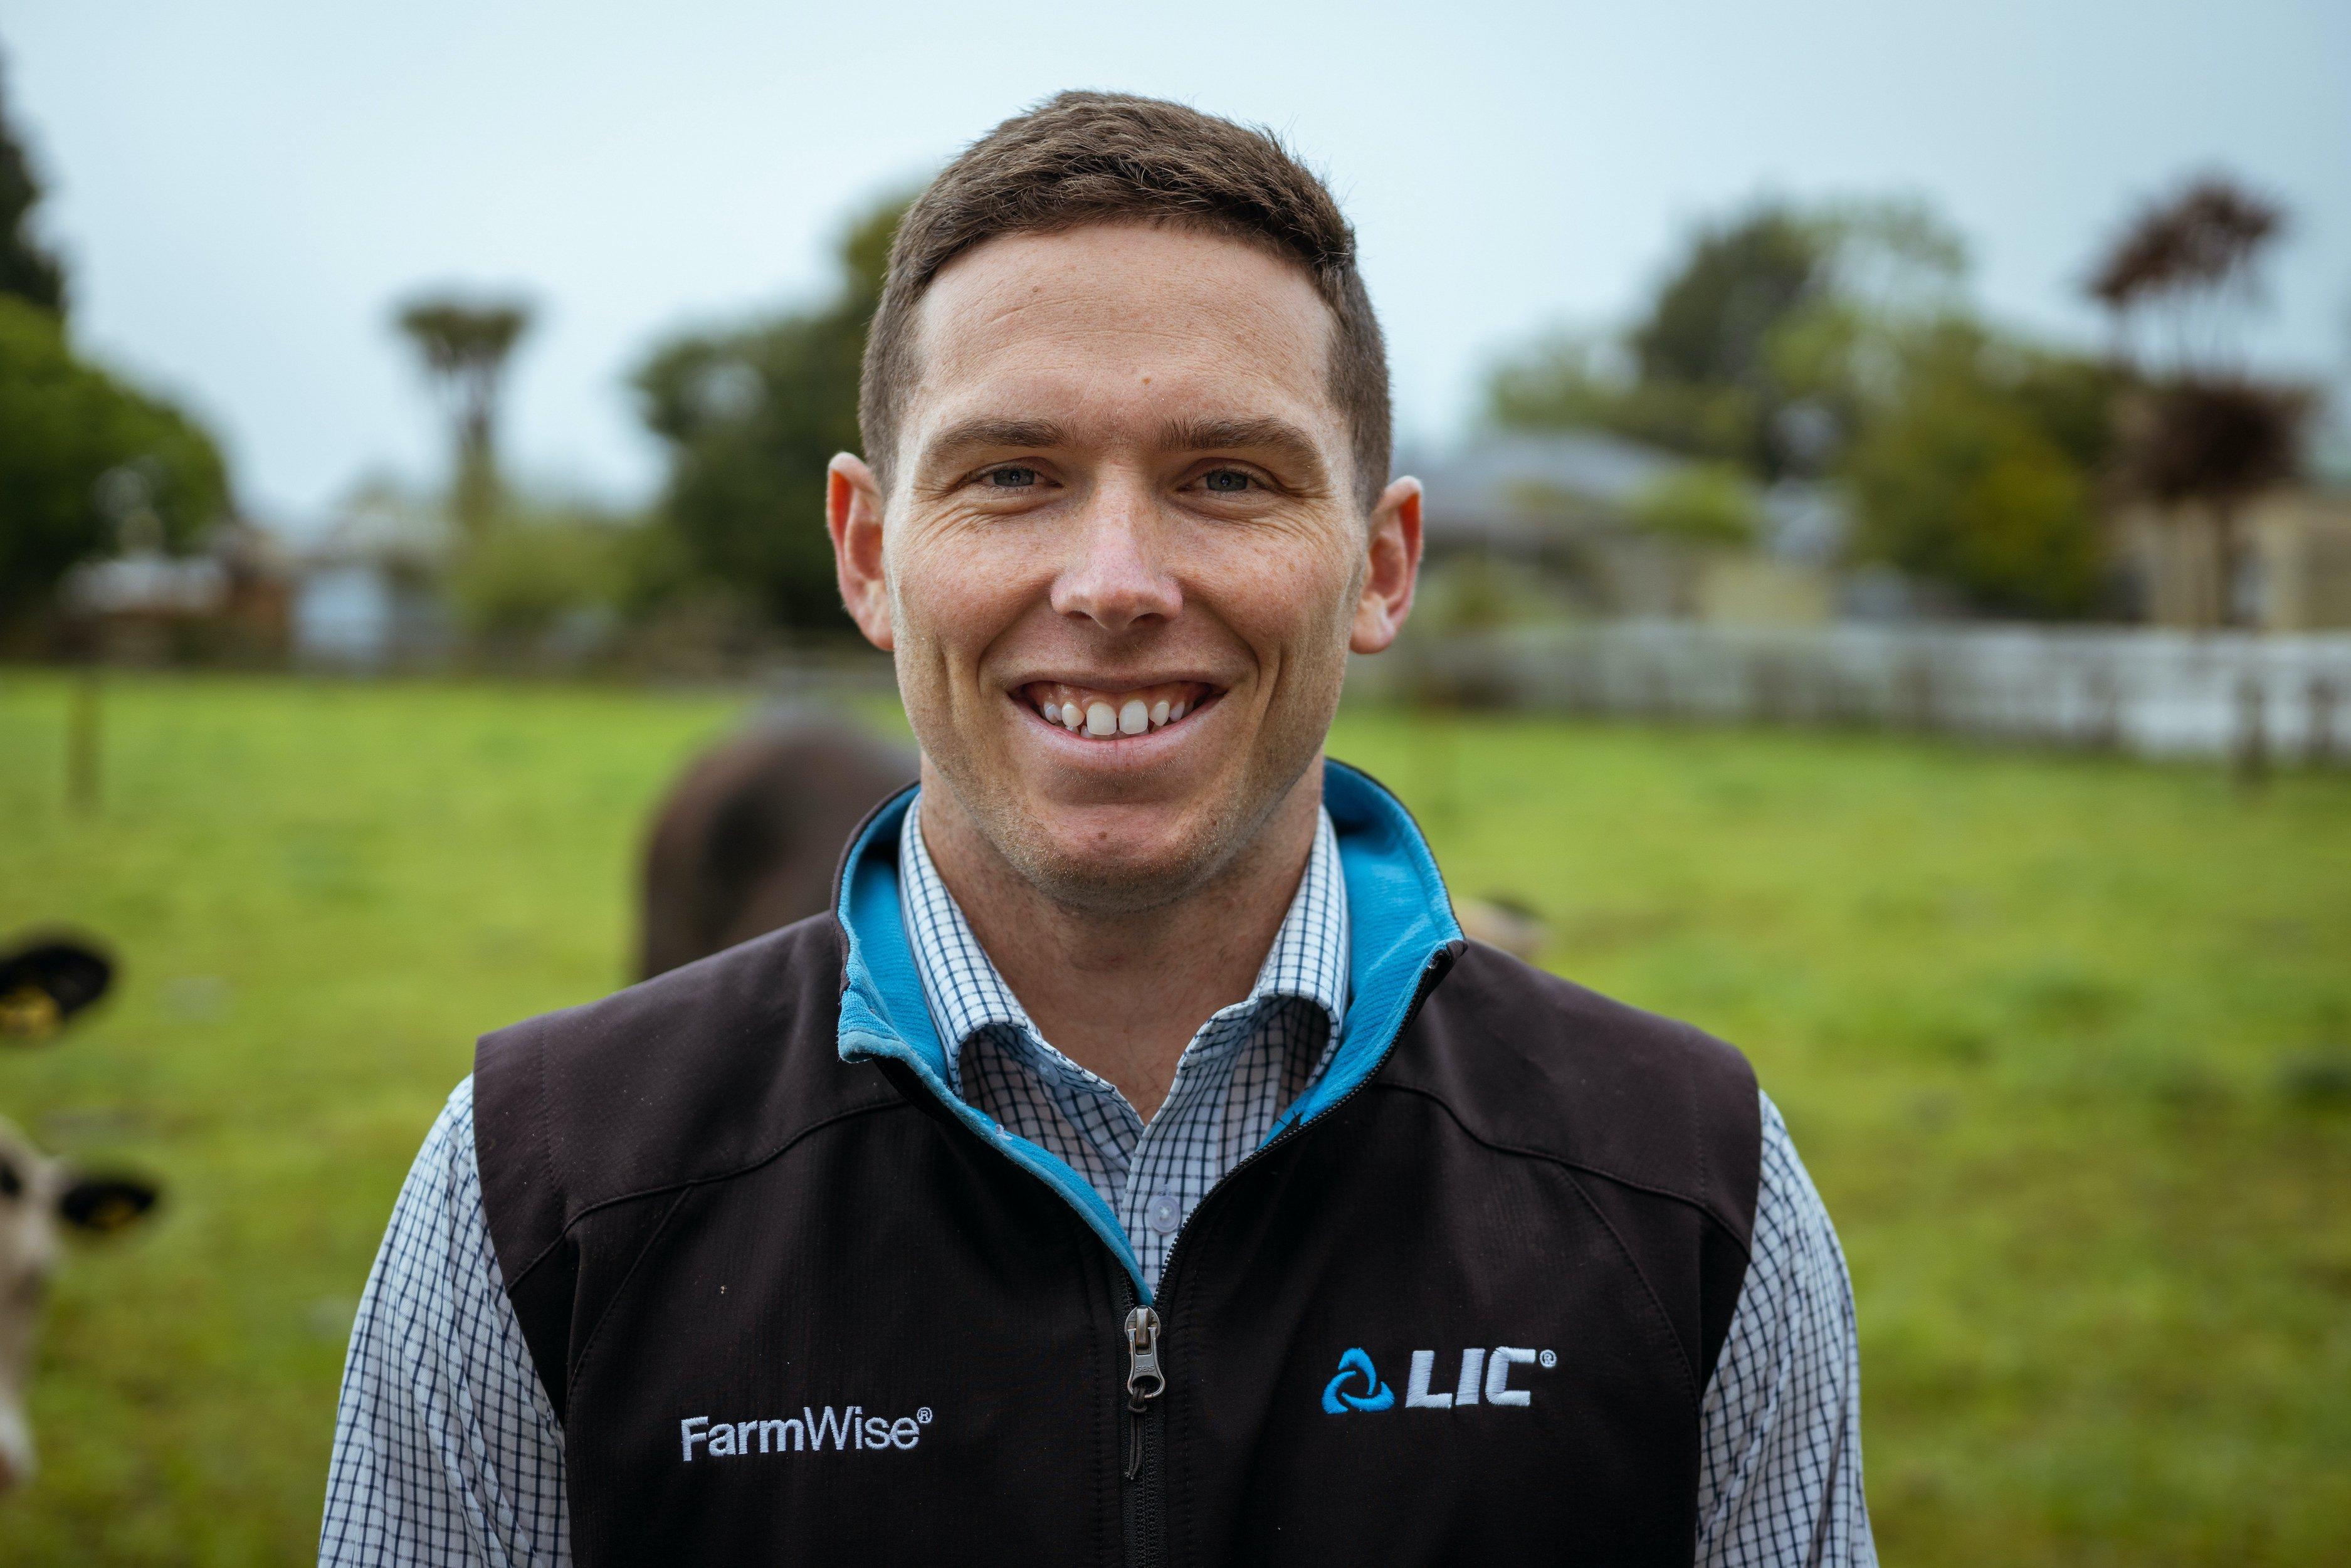 Regan FarmWise headshot October 2020